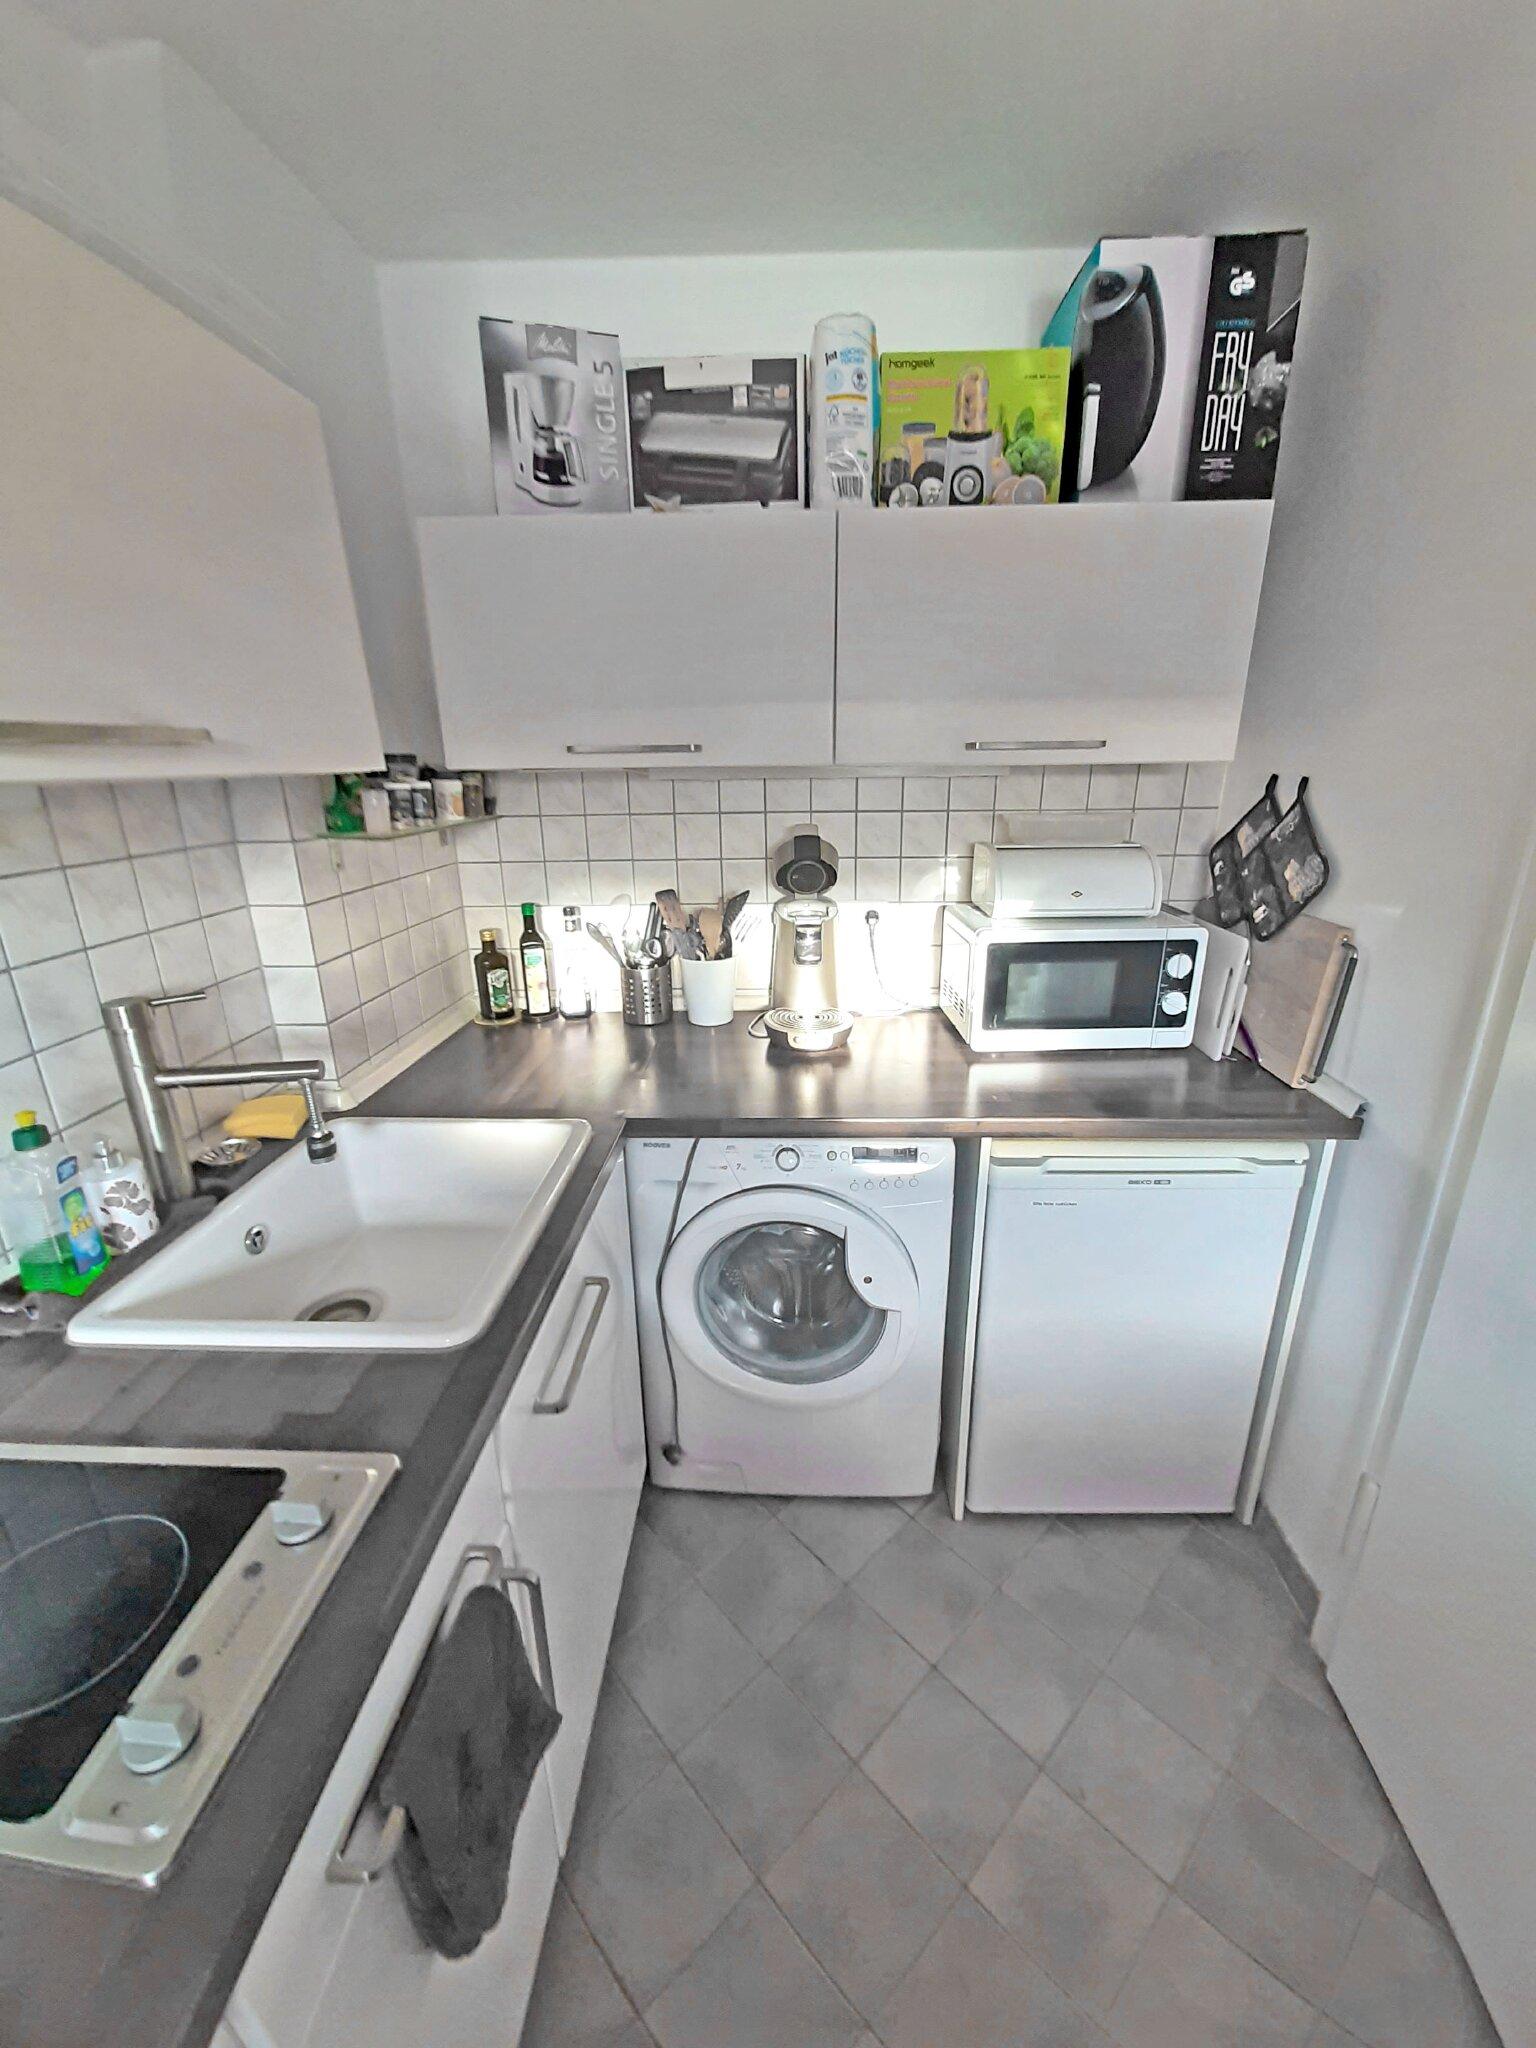 Küche: Senseo-Kaffeemaschine, Microwelle